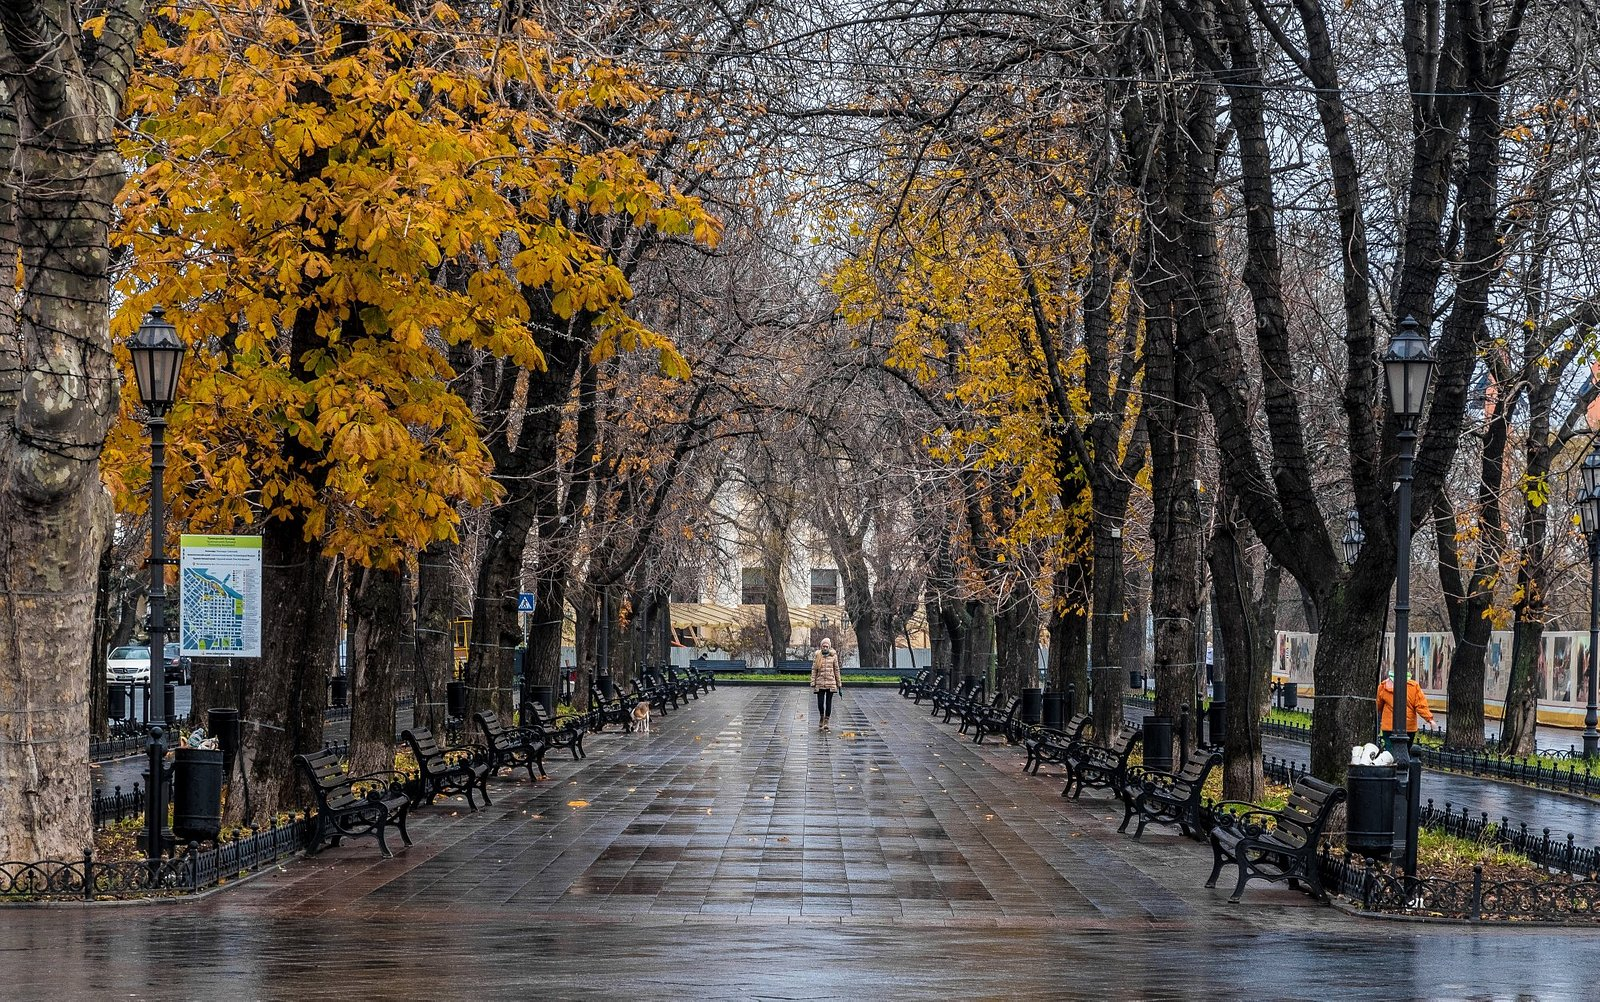 Boulevard View